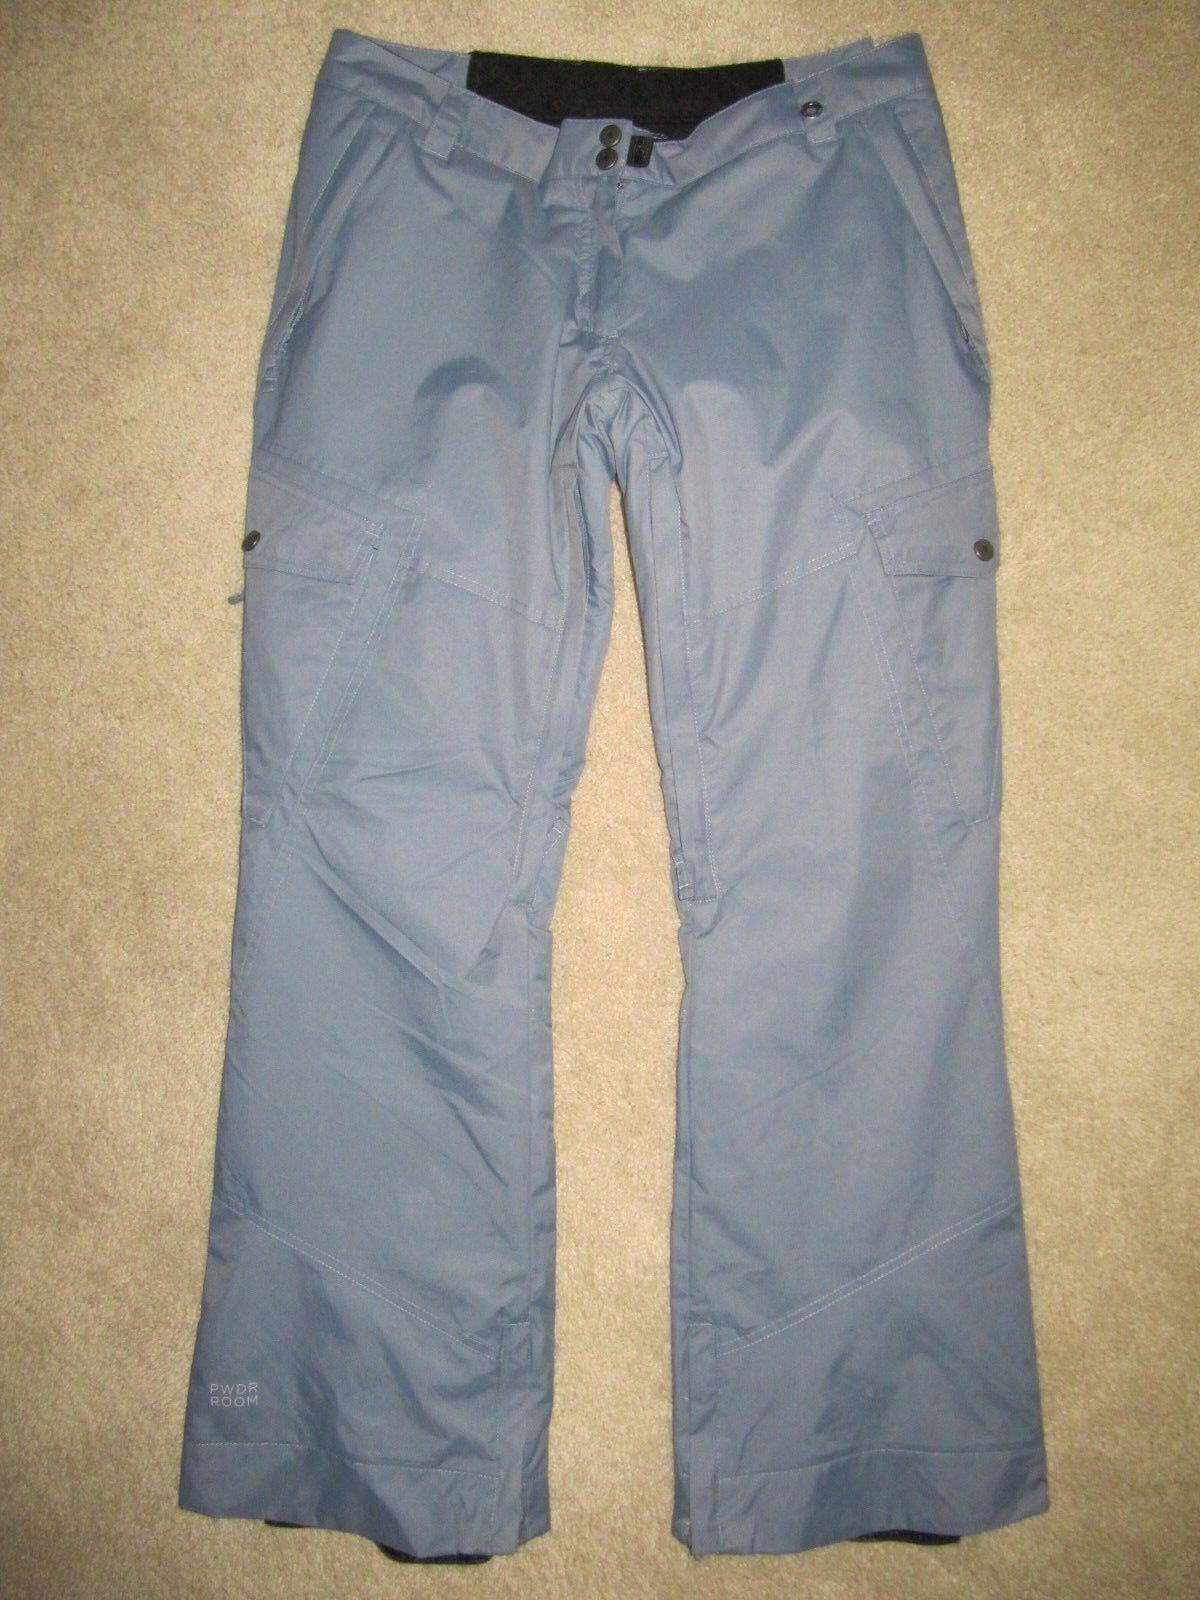 PWDR ROOM  Snowboard Ski Pants - Size M (32-36  waist)(31.5  leg)